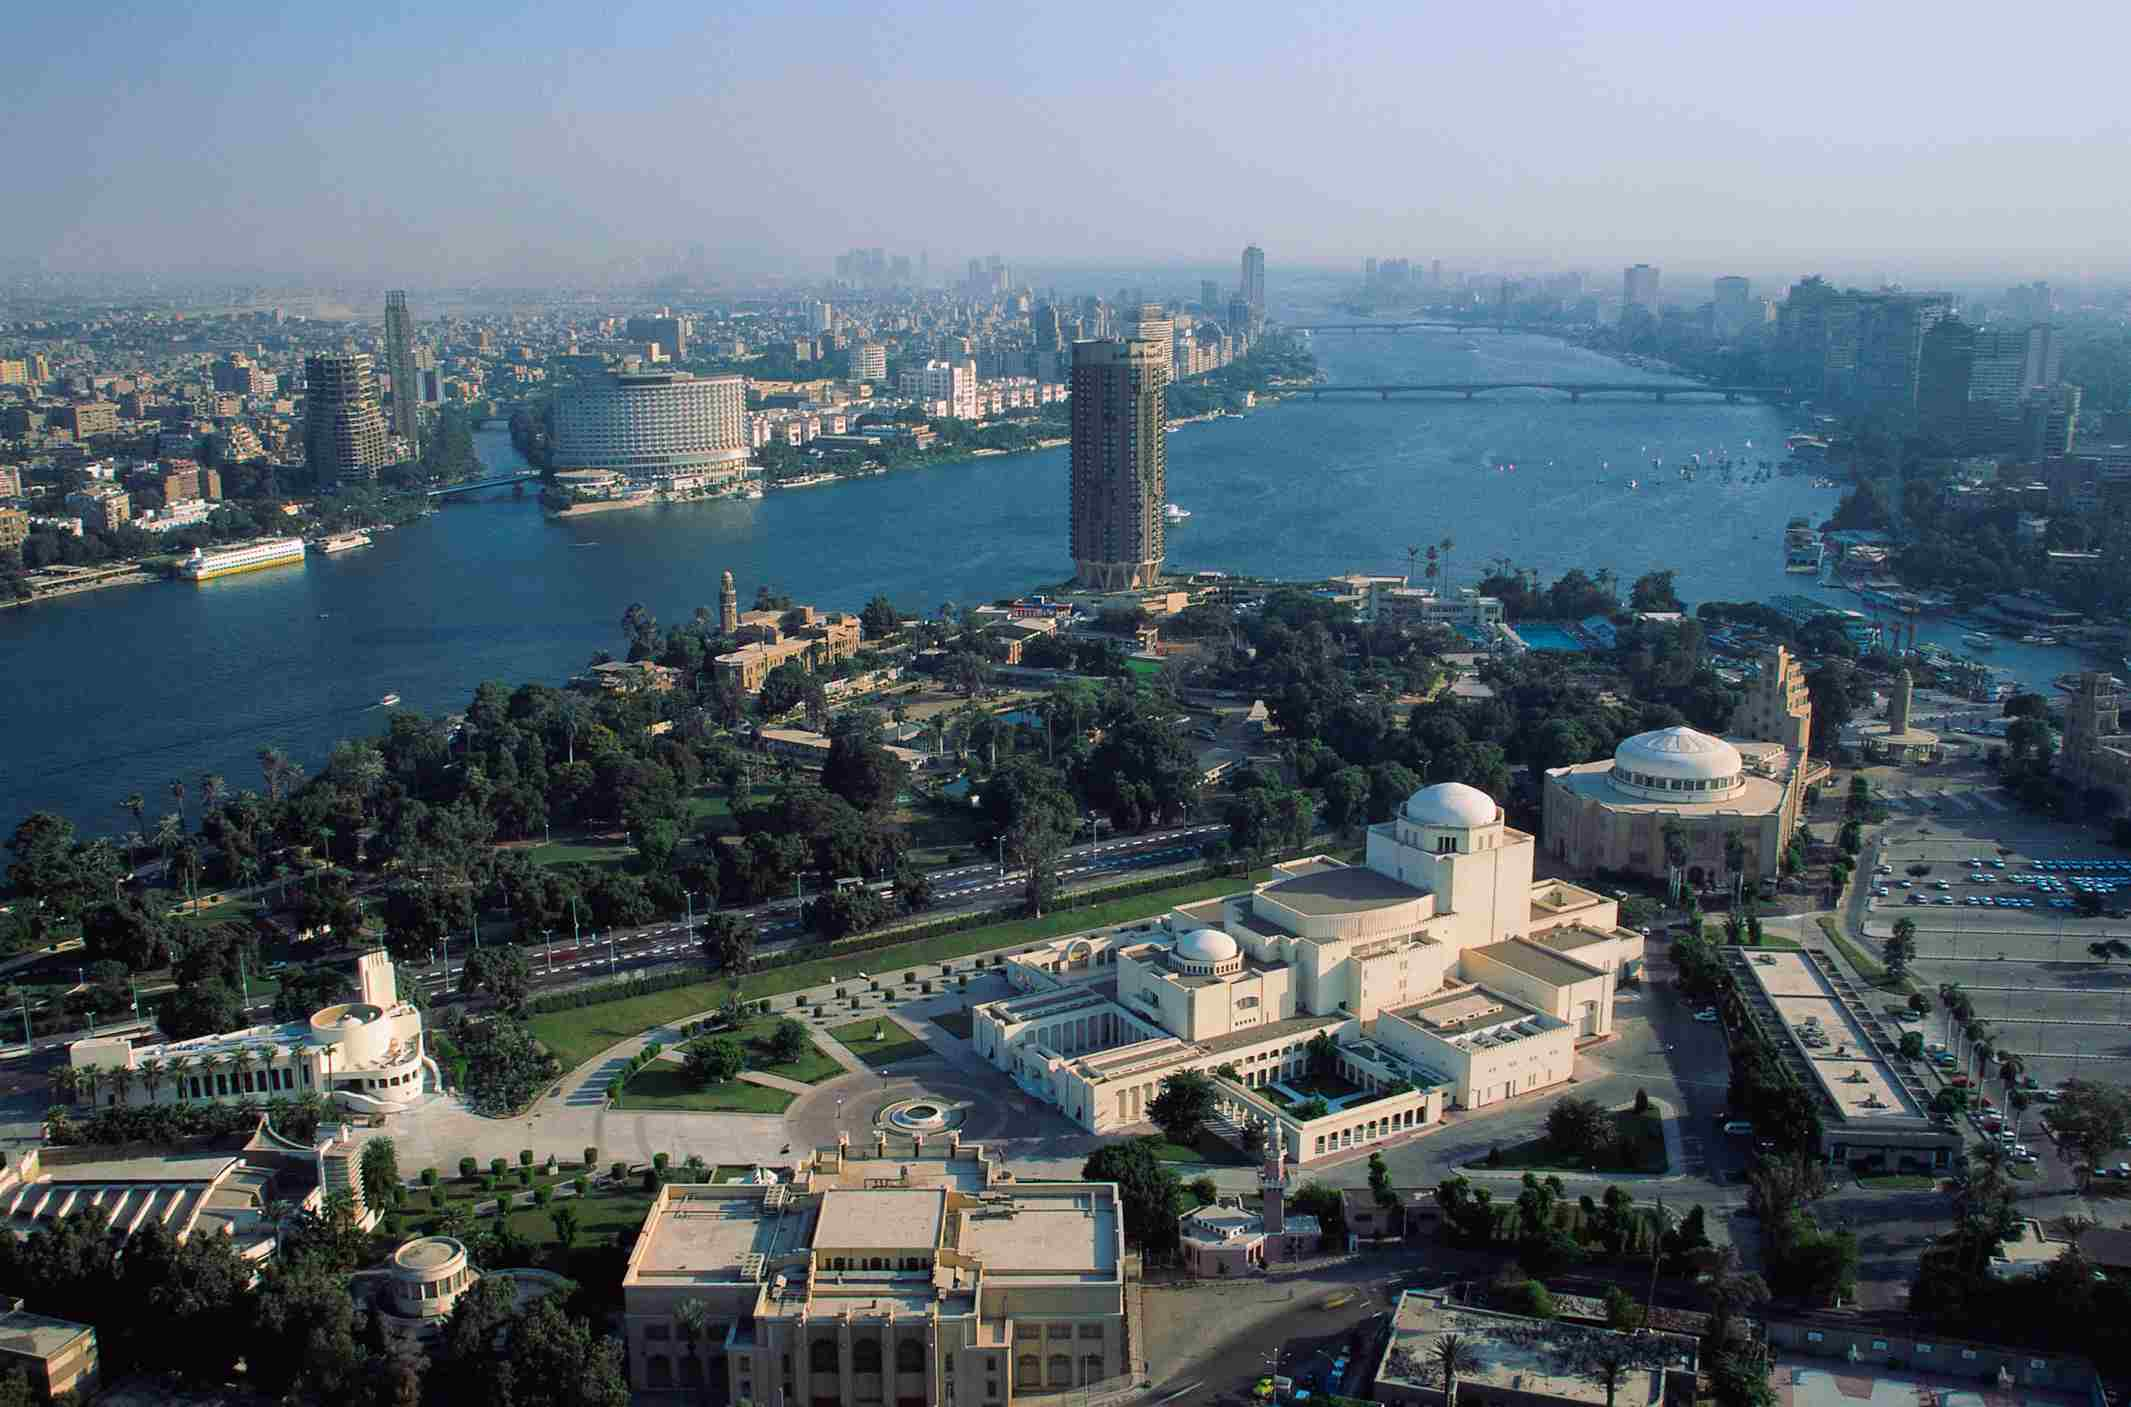 Cairo Opera House in Cairo, Egypt